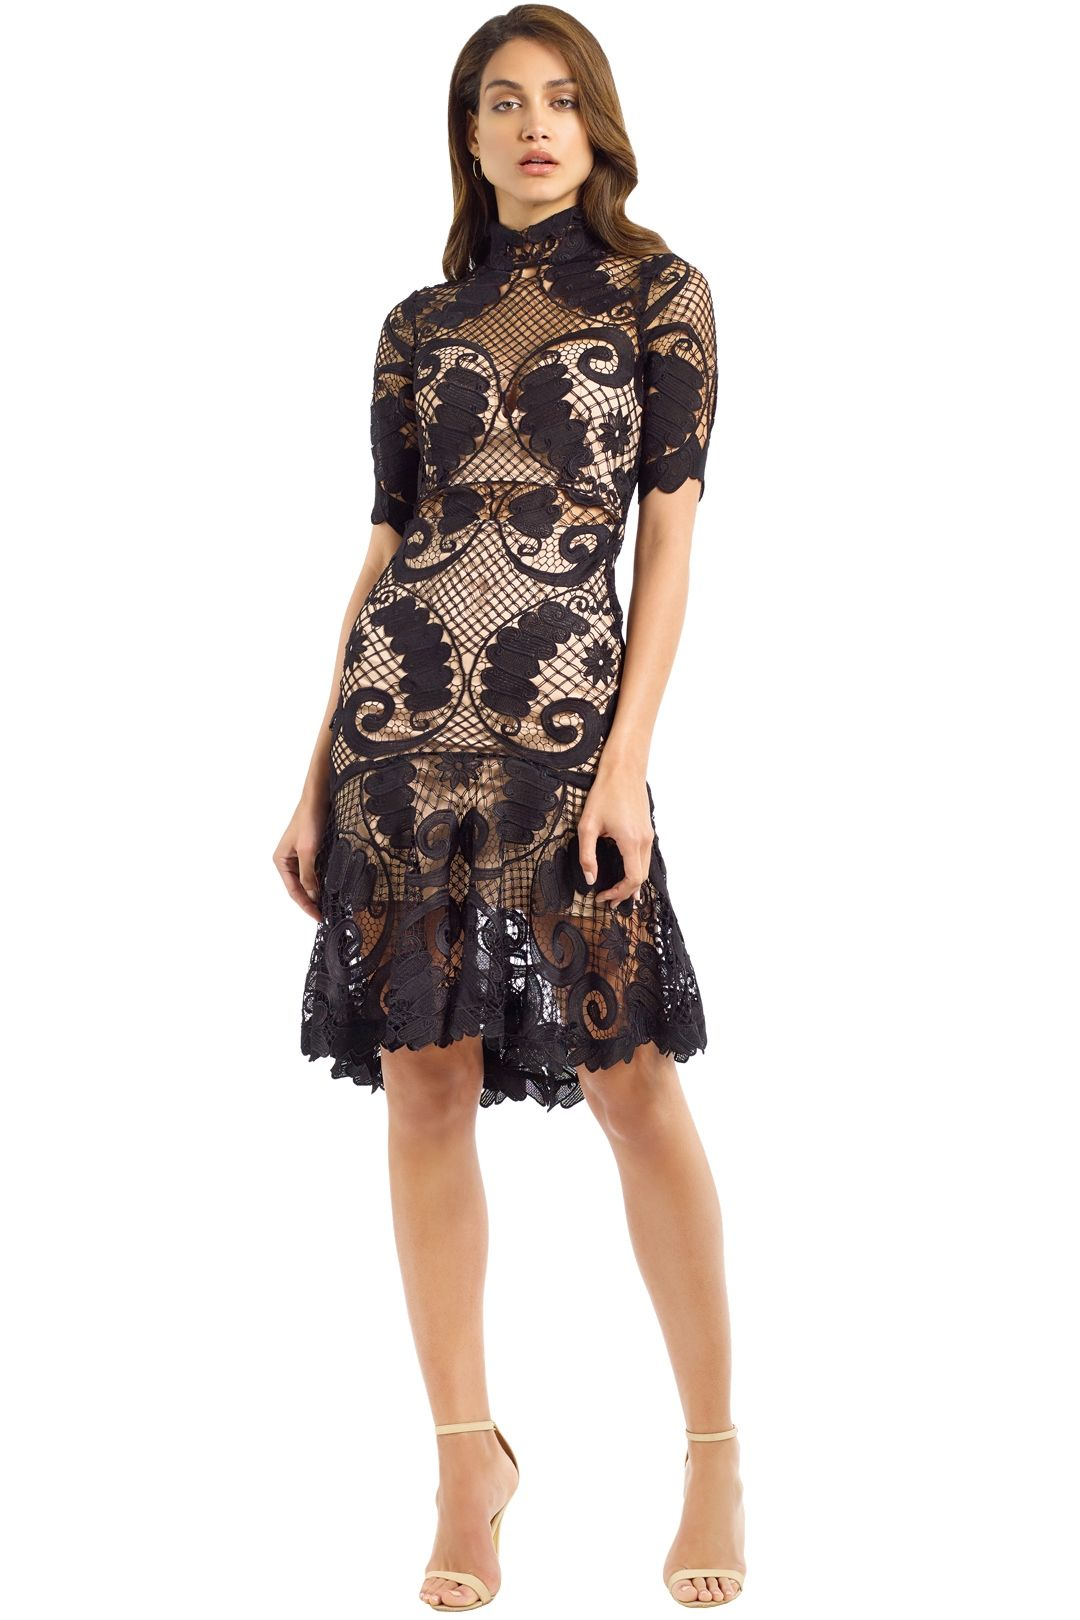 Thurley - Babylon Lace Dress - Black - Front